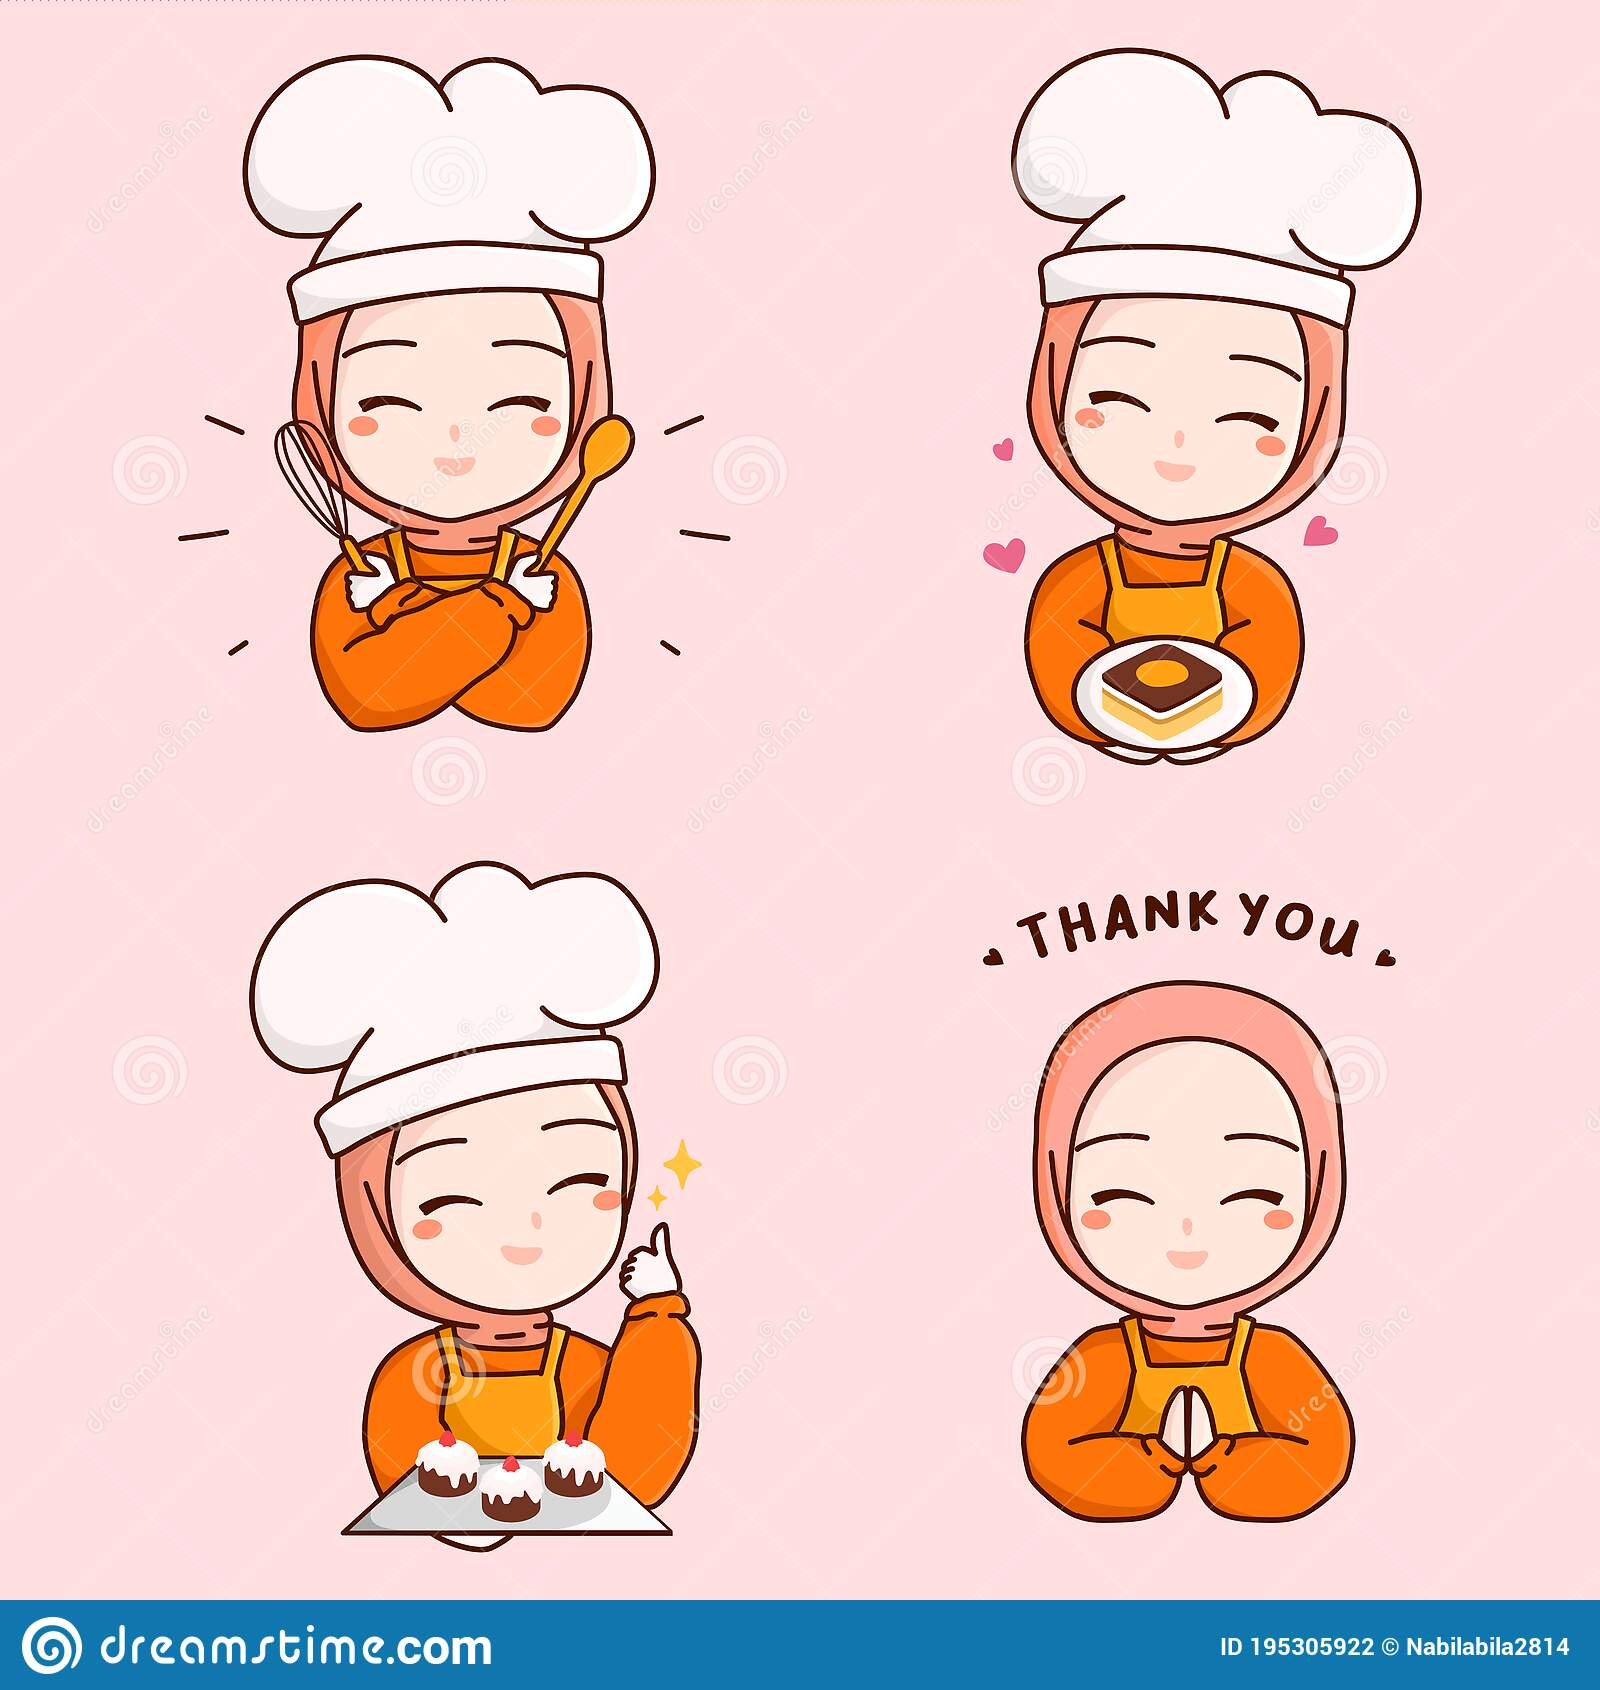 Muslim Chef Stock Illustrations 171 Muslim Chef Stock Illustrations Vectors Clipart Dreamstime